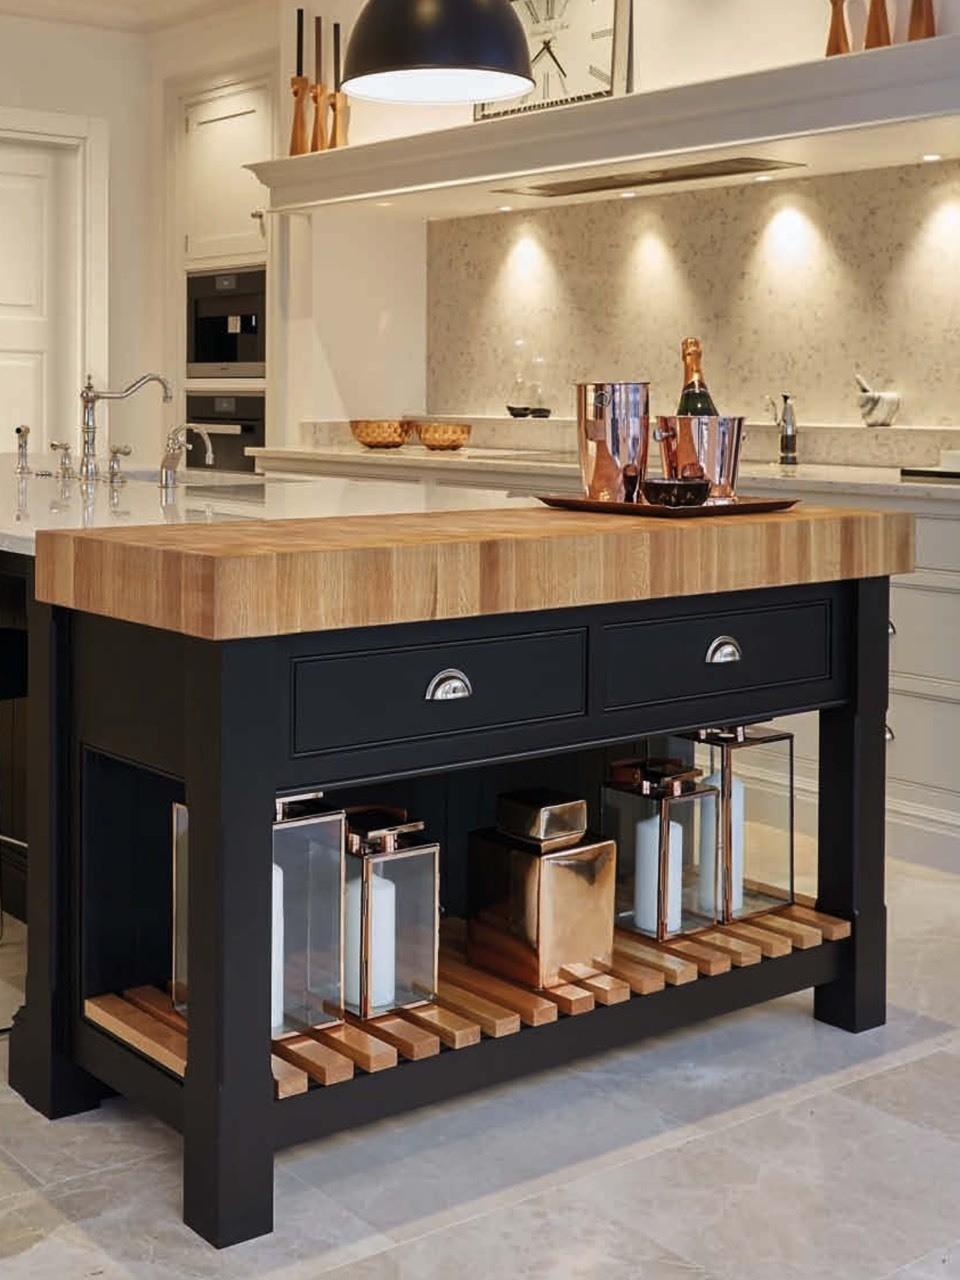 Kitchen workboard/table